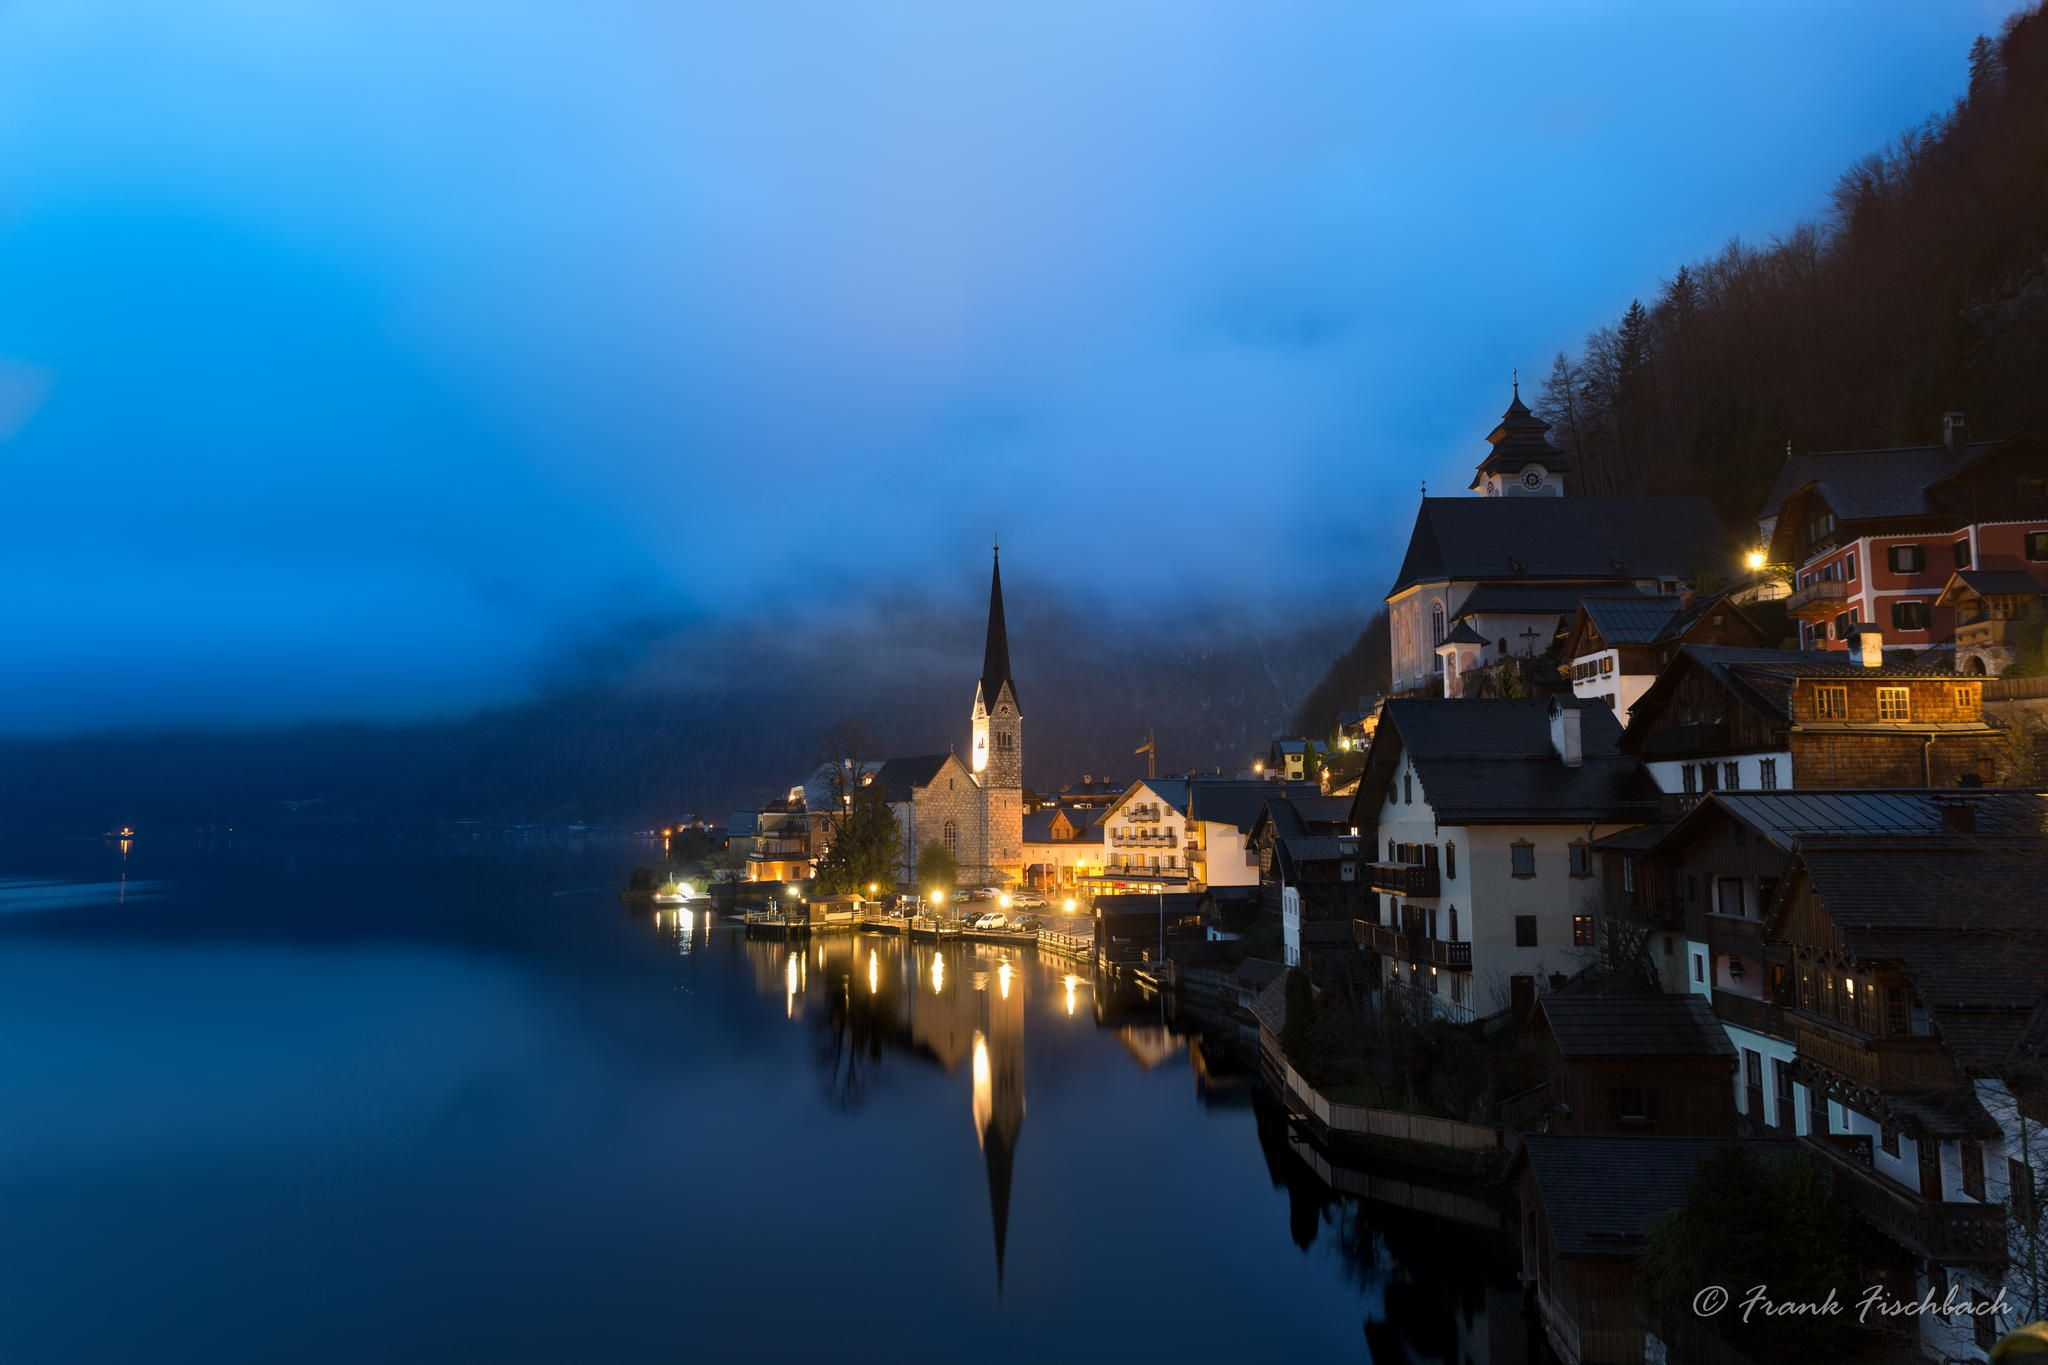 Dawn At Lake Hallstatt, Salzkammergut, Austrian Alps By Frank Fischbach